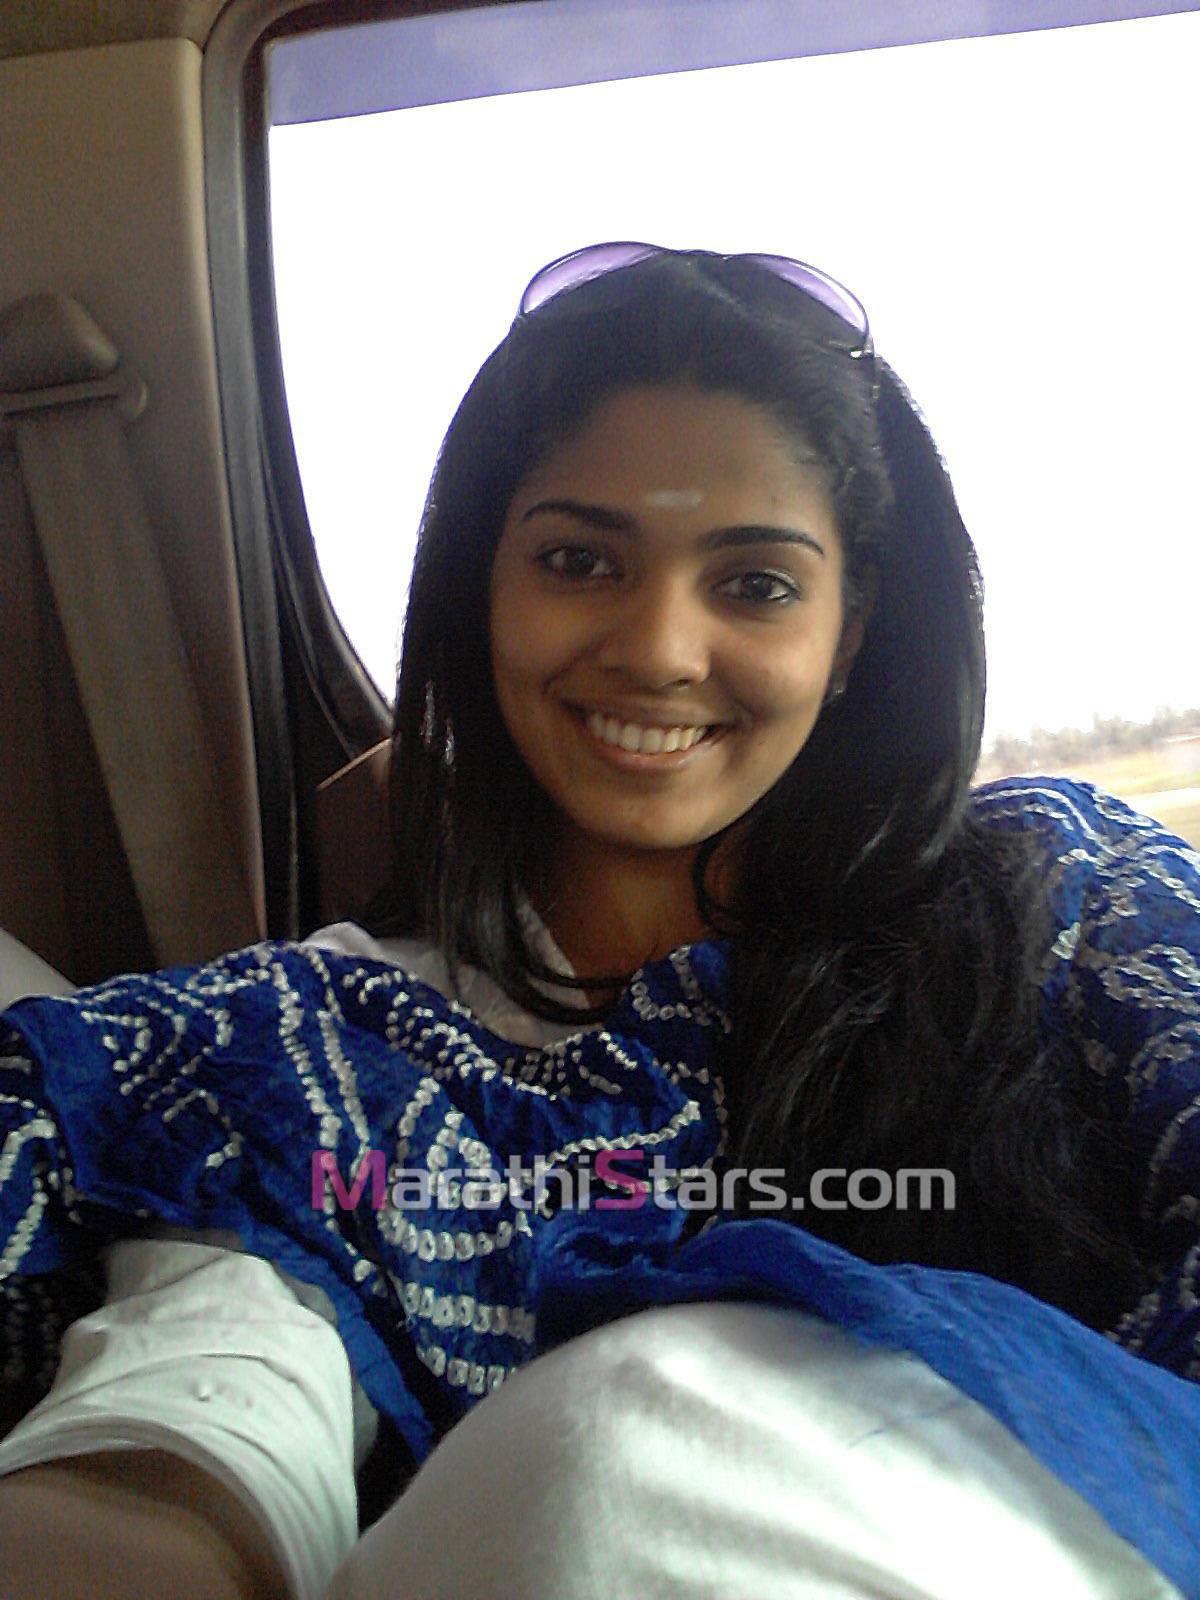 Marathi Girl Hd Wallpaper Pooja Sawant Marathi Actress Photos Biography Wallpapers